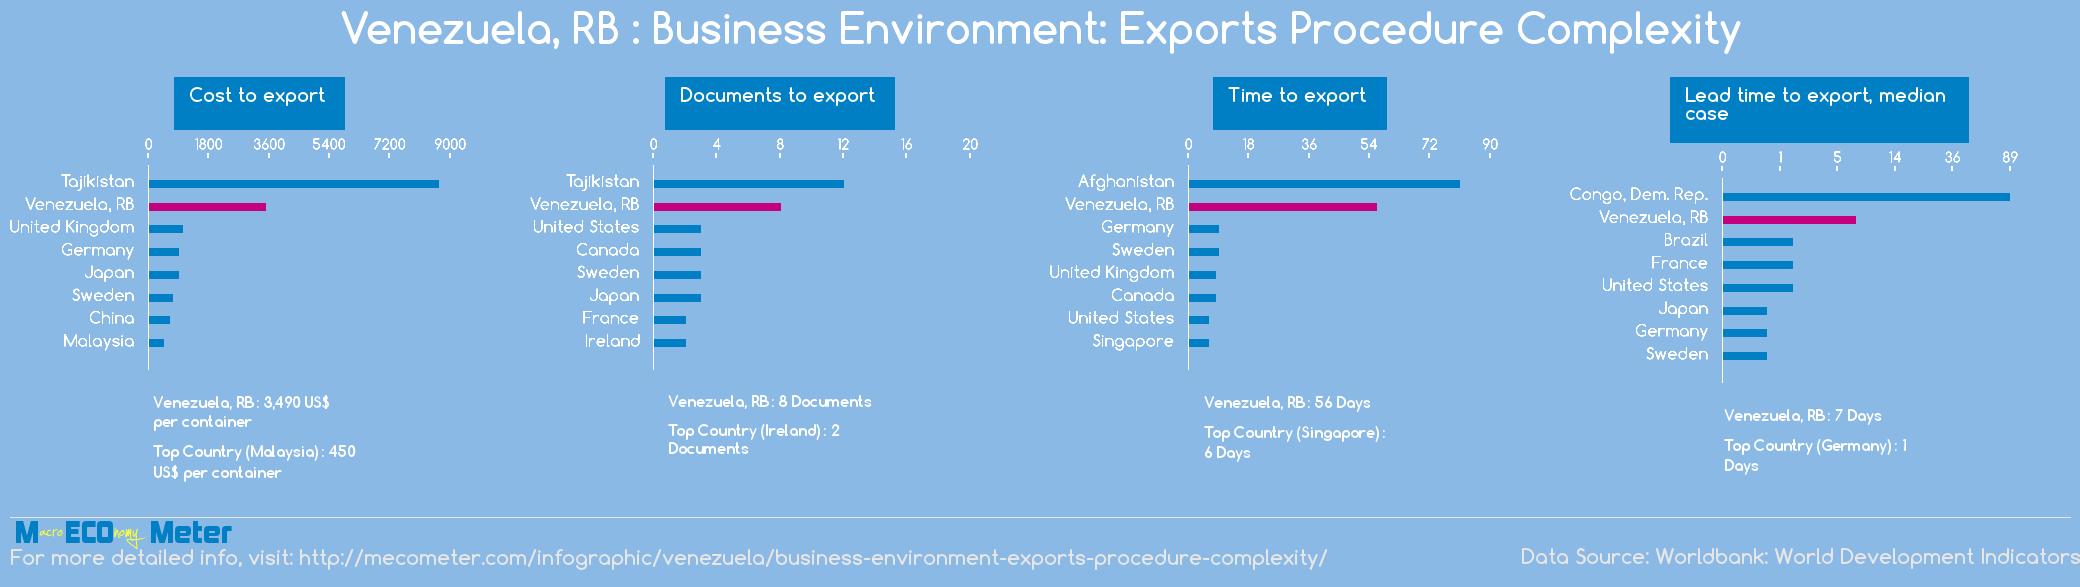 Venezuela, RB : Business Environment: Exports Procedure Complexity